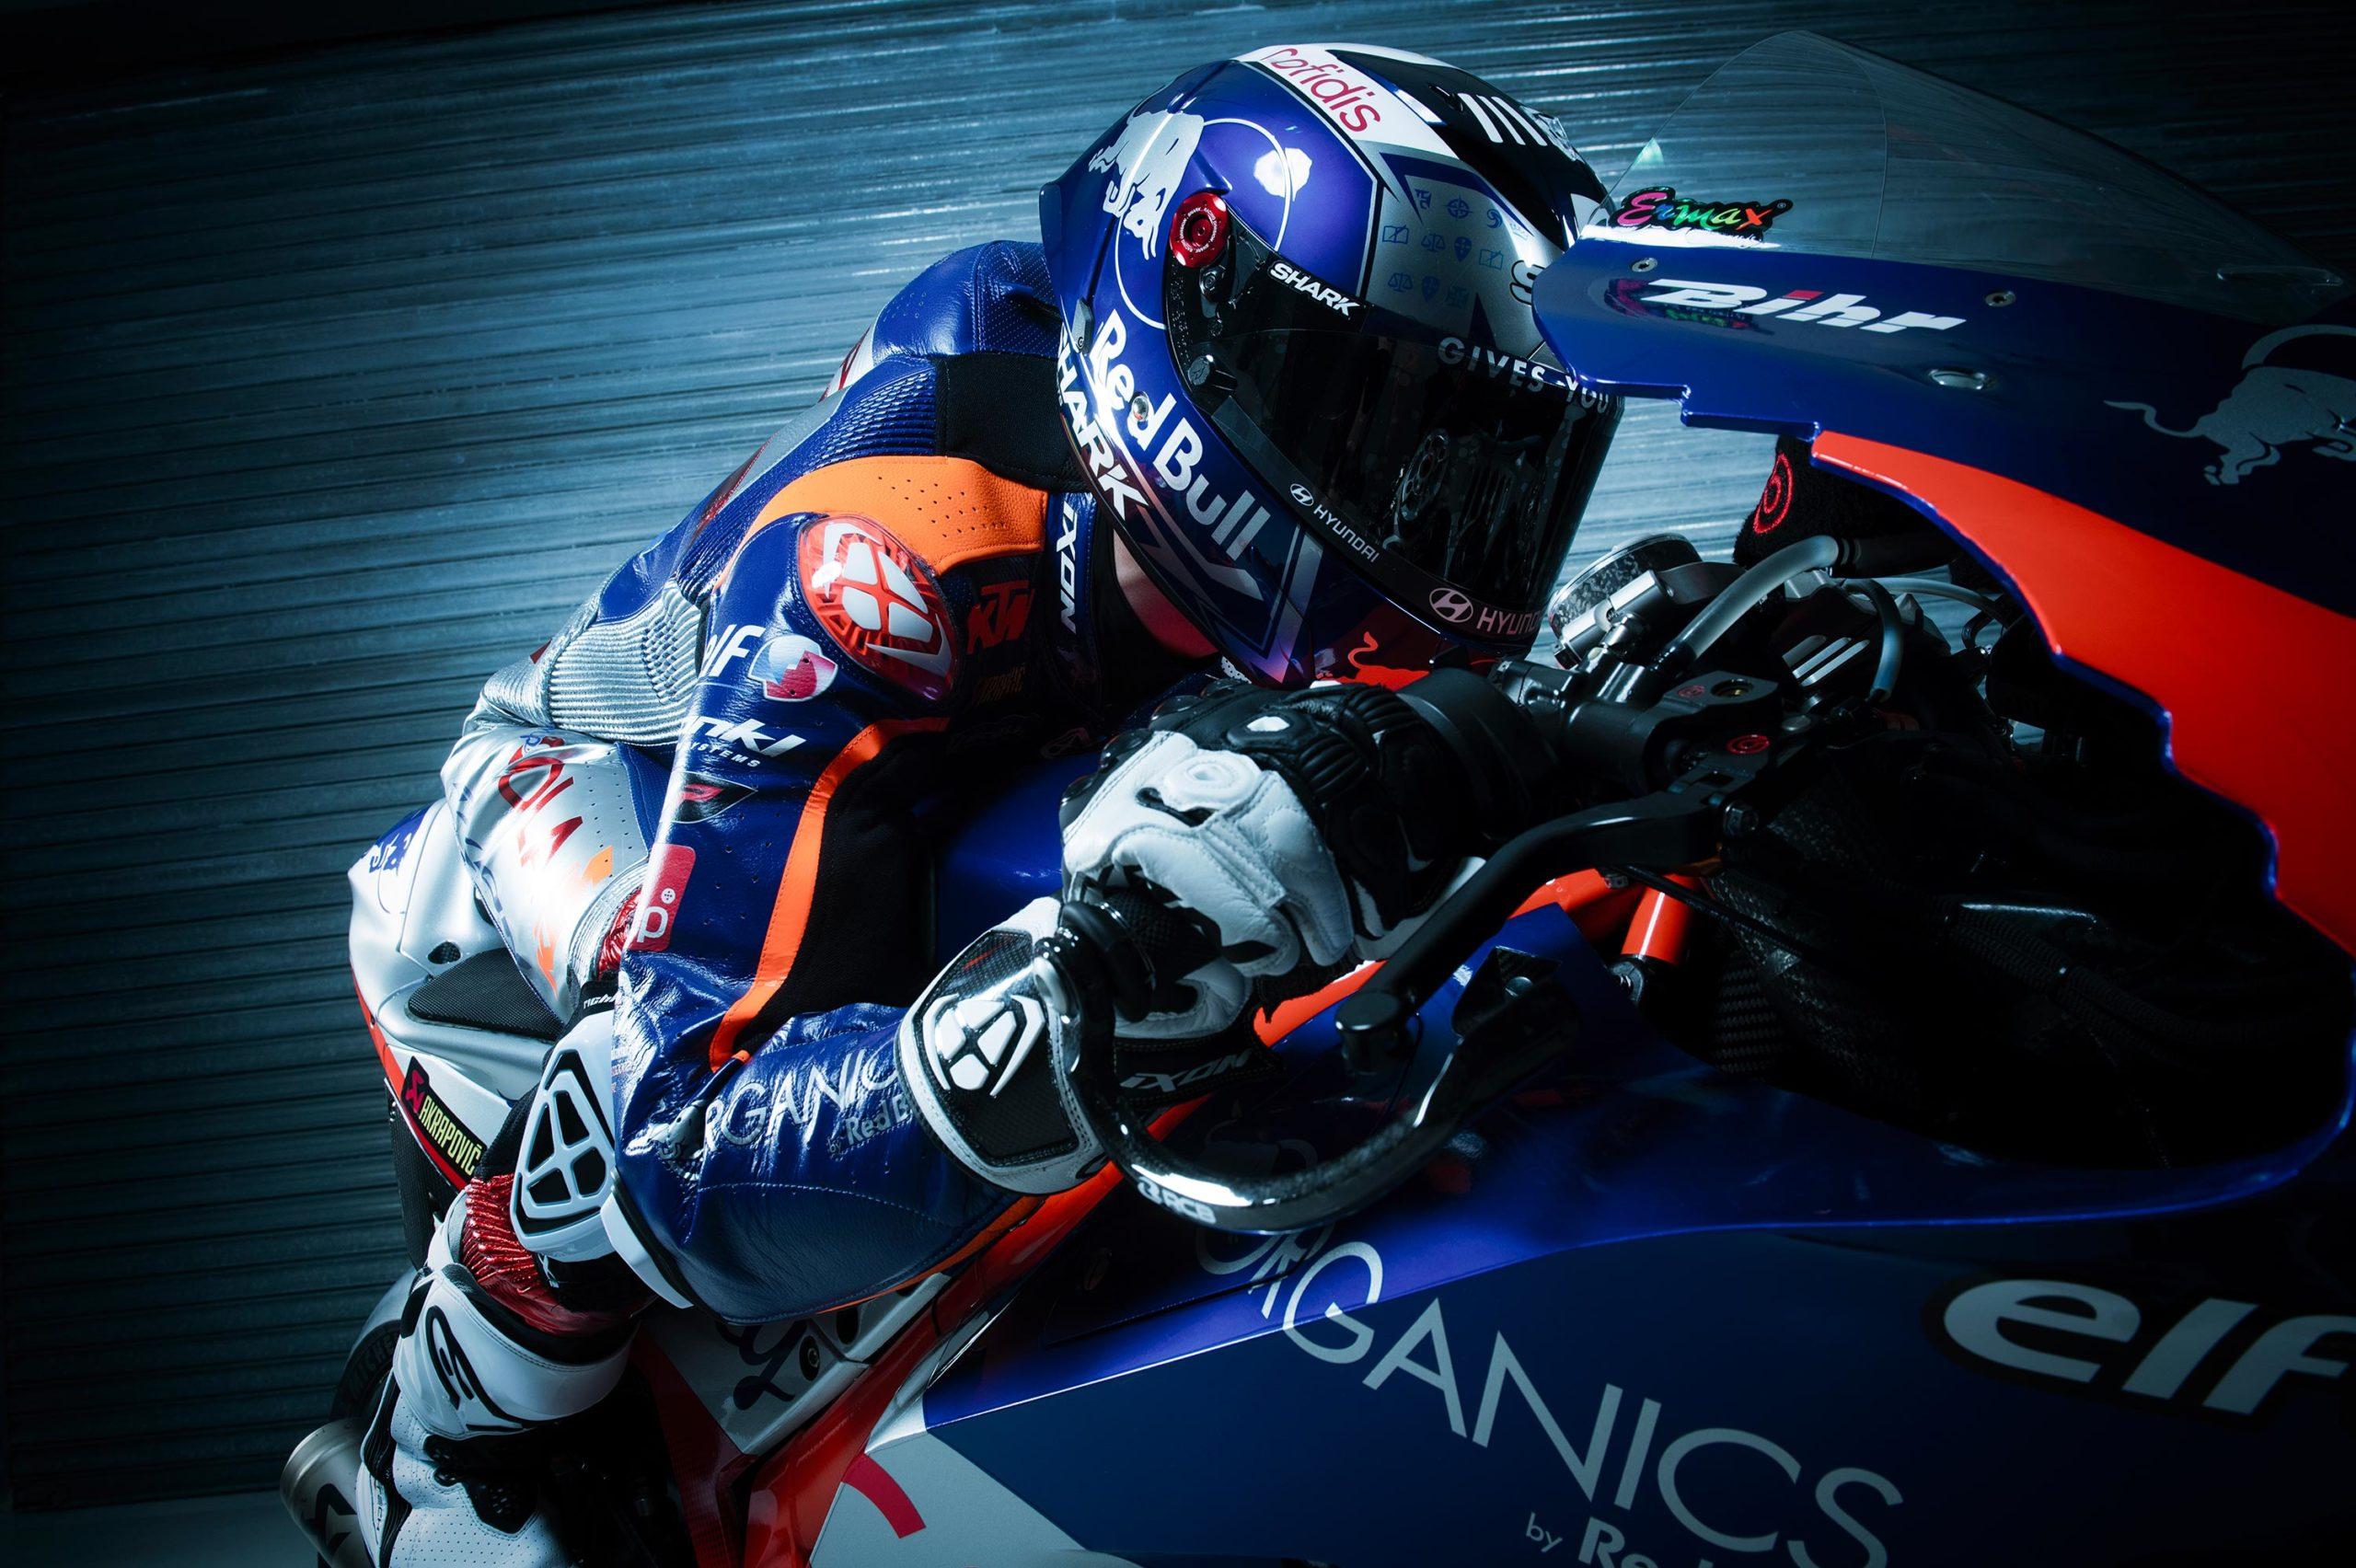 Misano Private Motogp Test Miguel Oliveira Fastest While Aprilia Ducati Test New Aero Asphalt Rubber